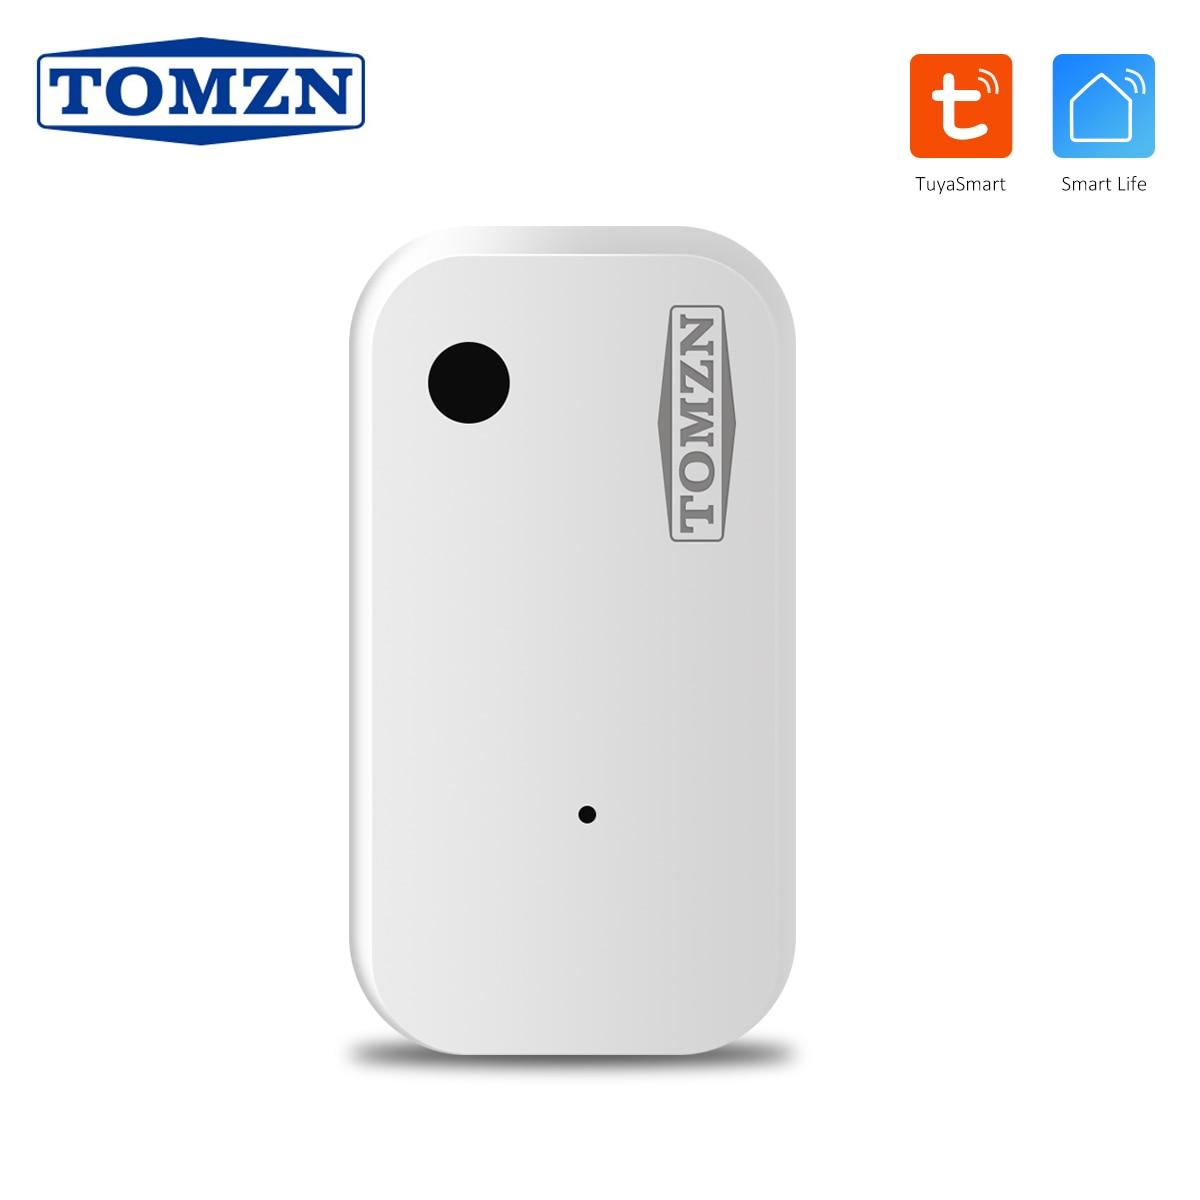 Tuya-مستشعر إضاءة WIFI Smartlife ، سطوع ضوء TOMZN مدعوم من USB ، التحكم في ربط مستشعر التشغيل الآلي